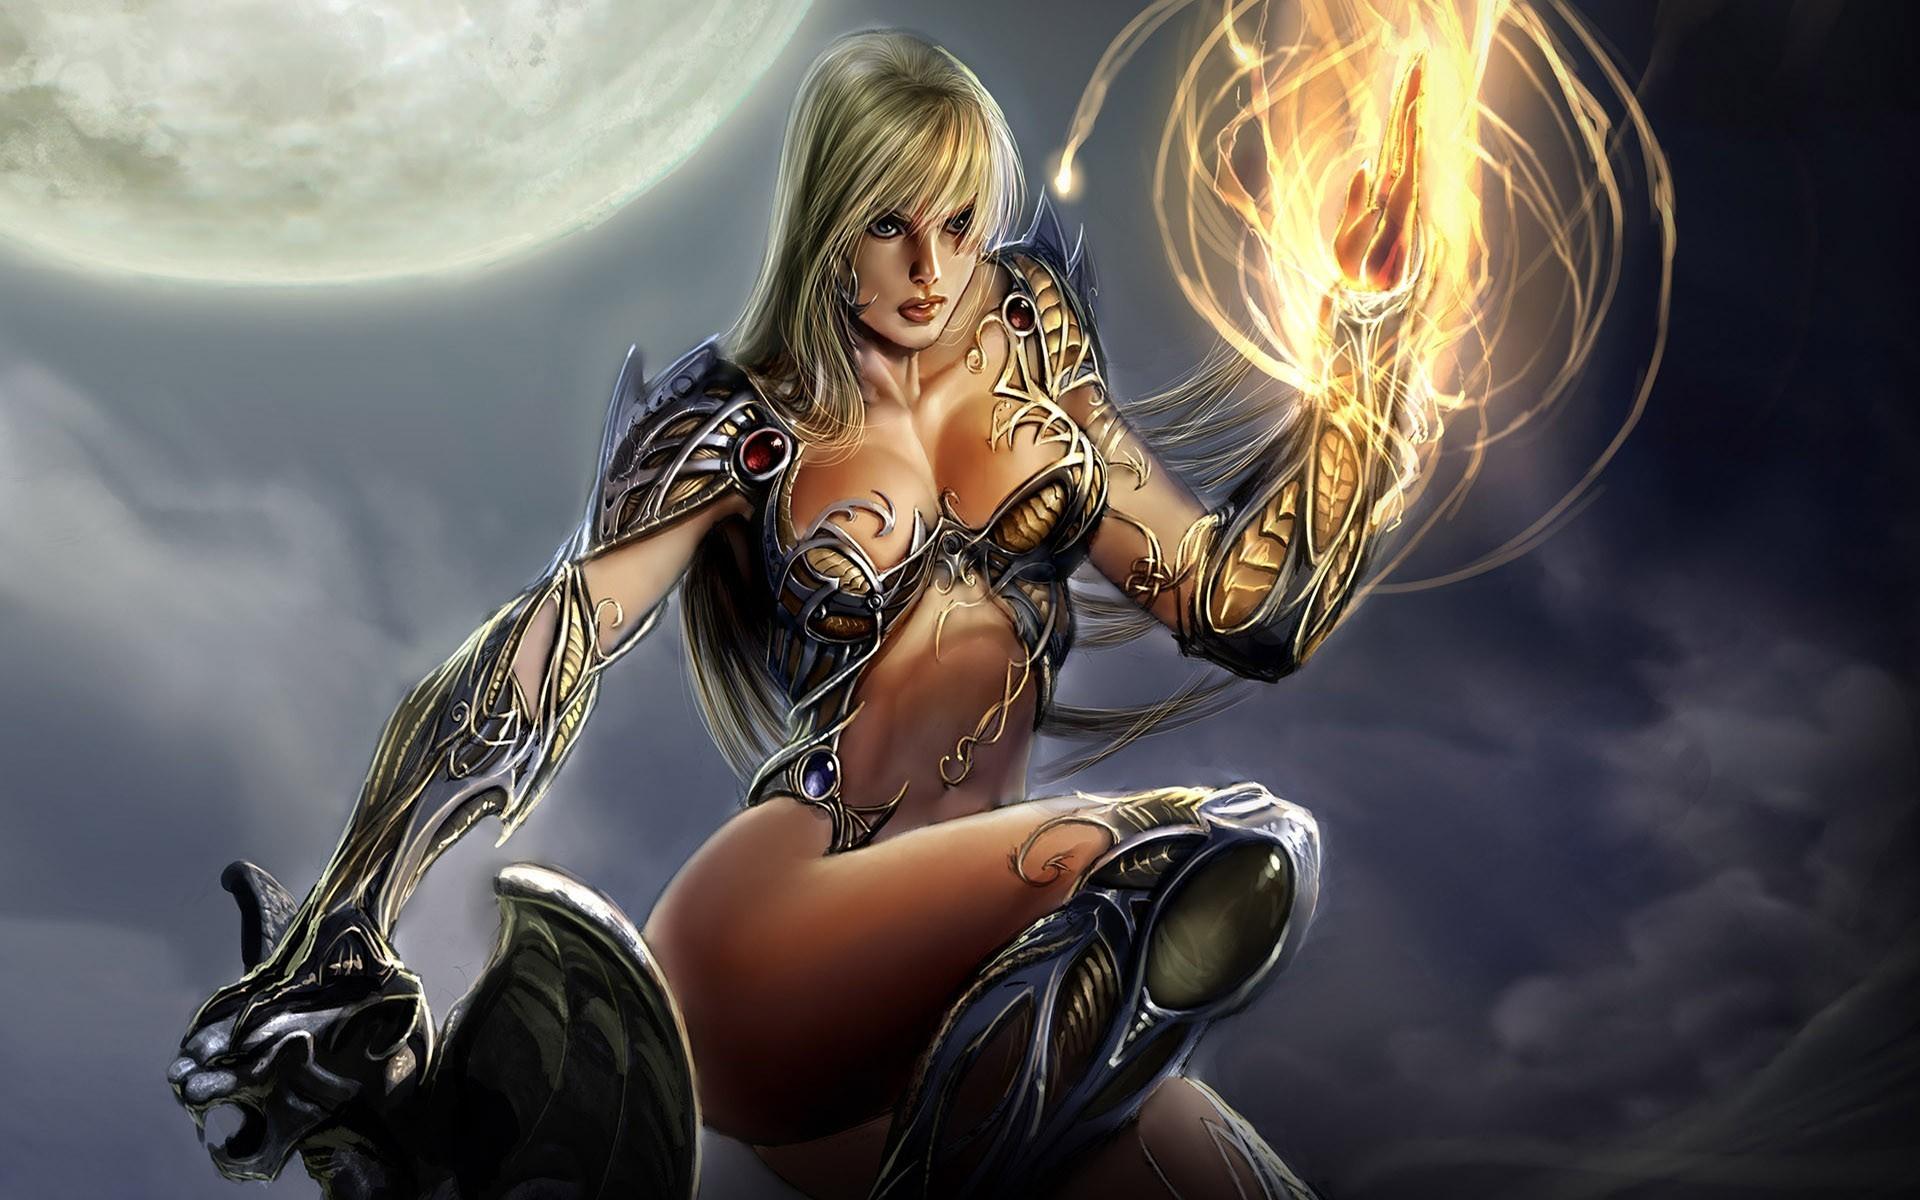 Sexy fantasy girls